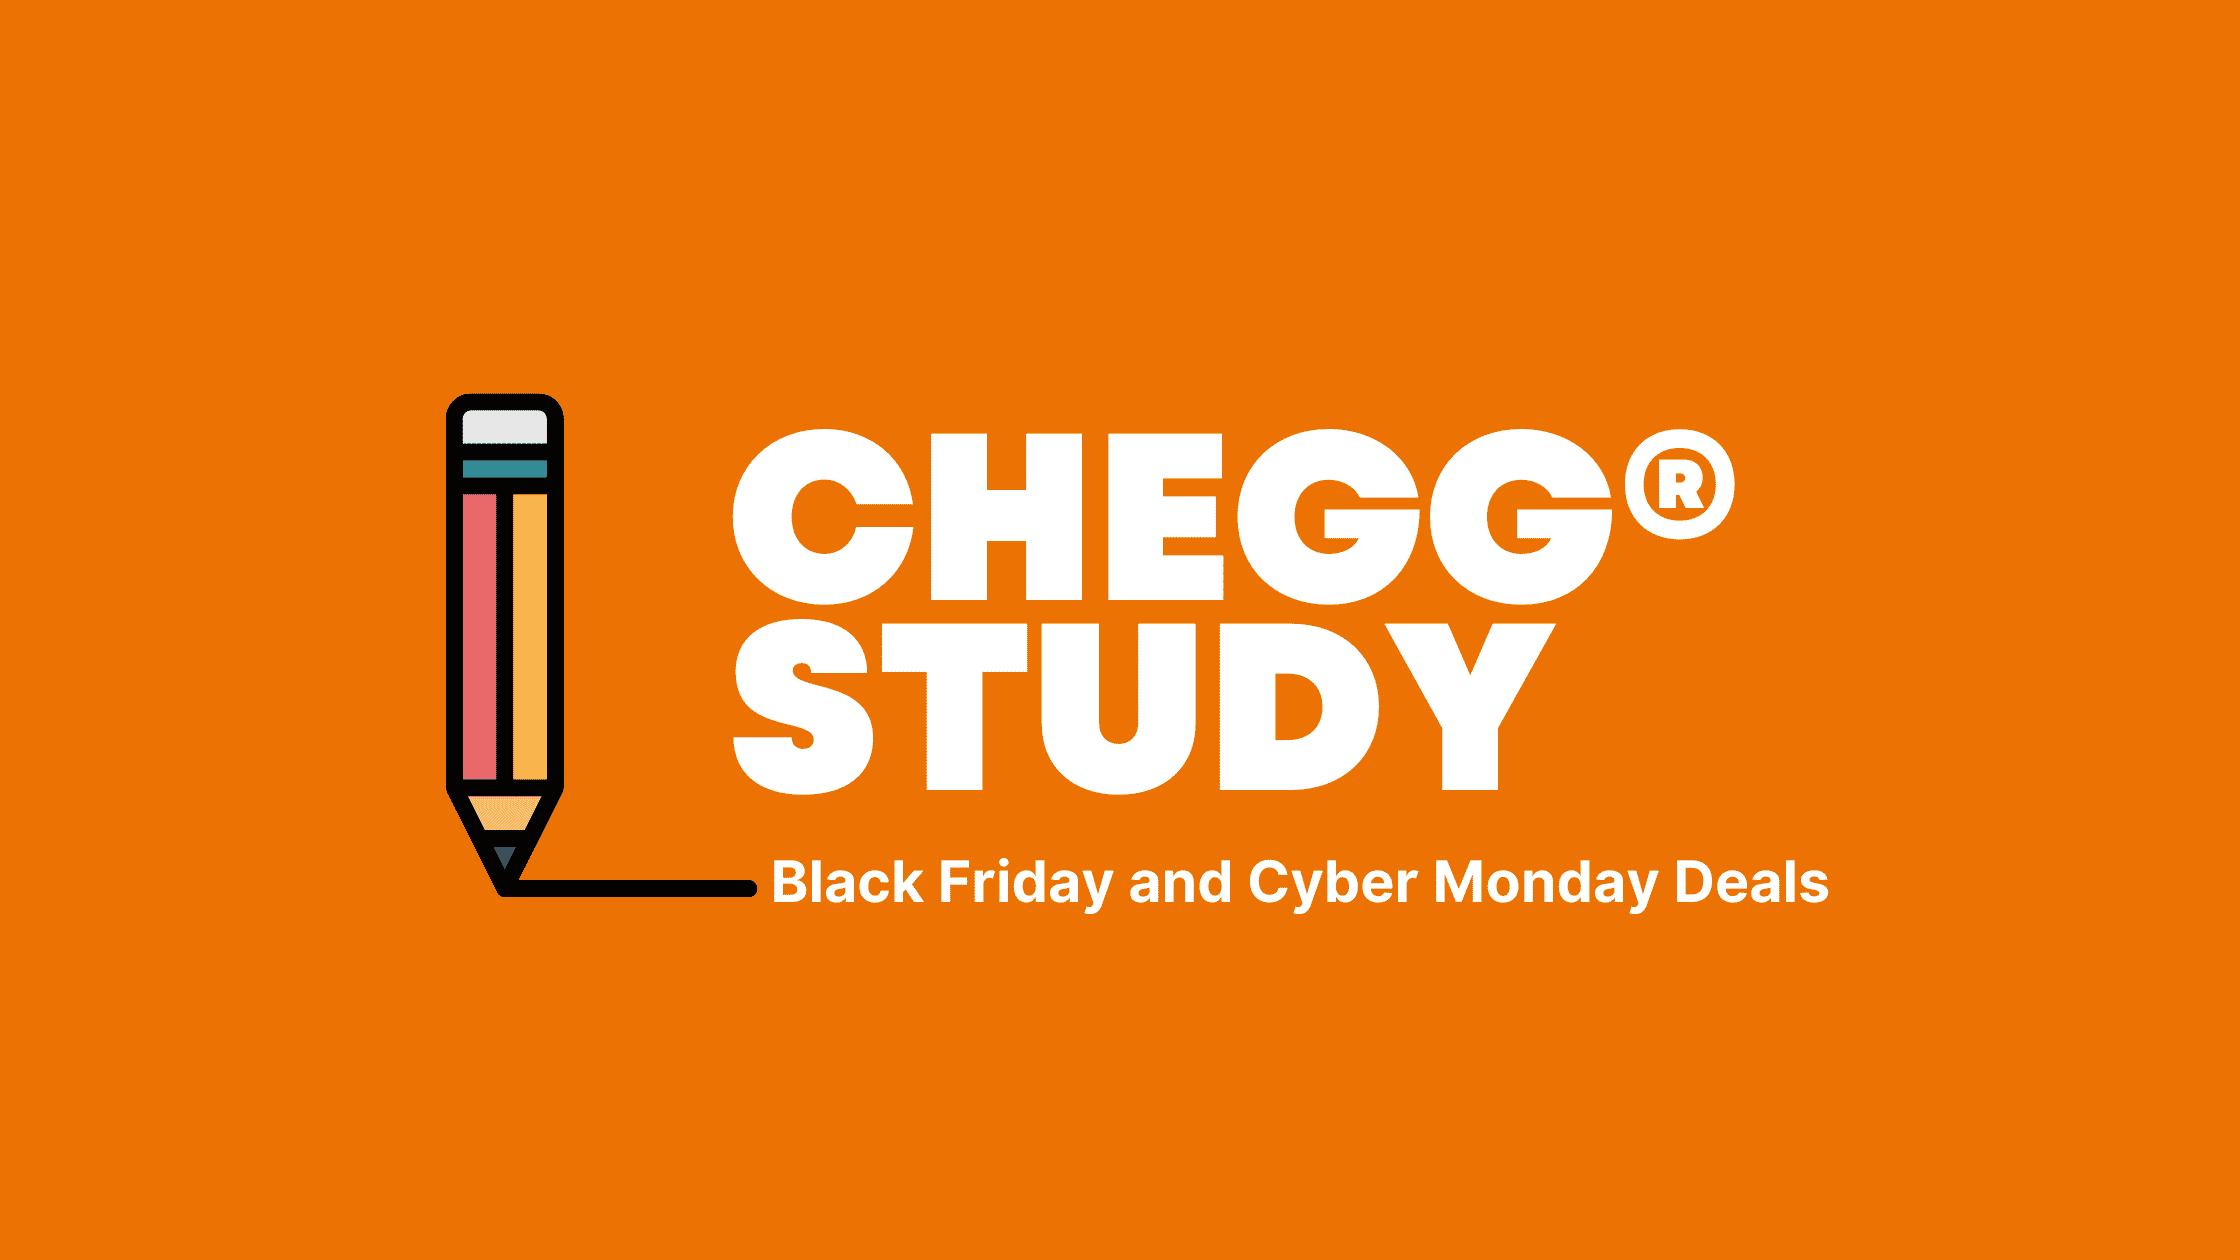 Chegg Study Black Friday deals in 2020